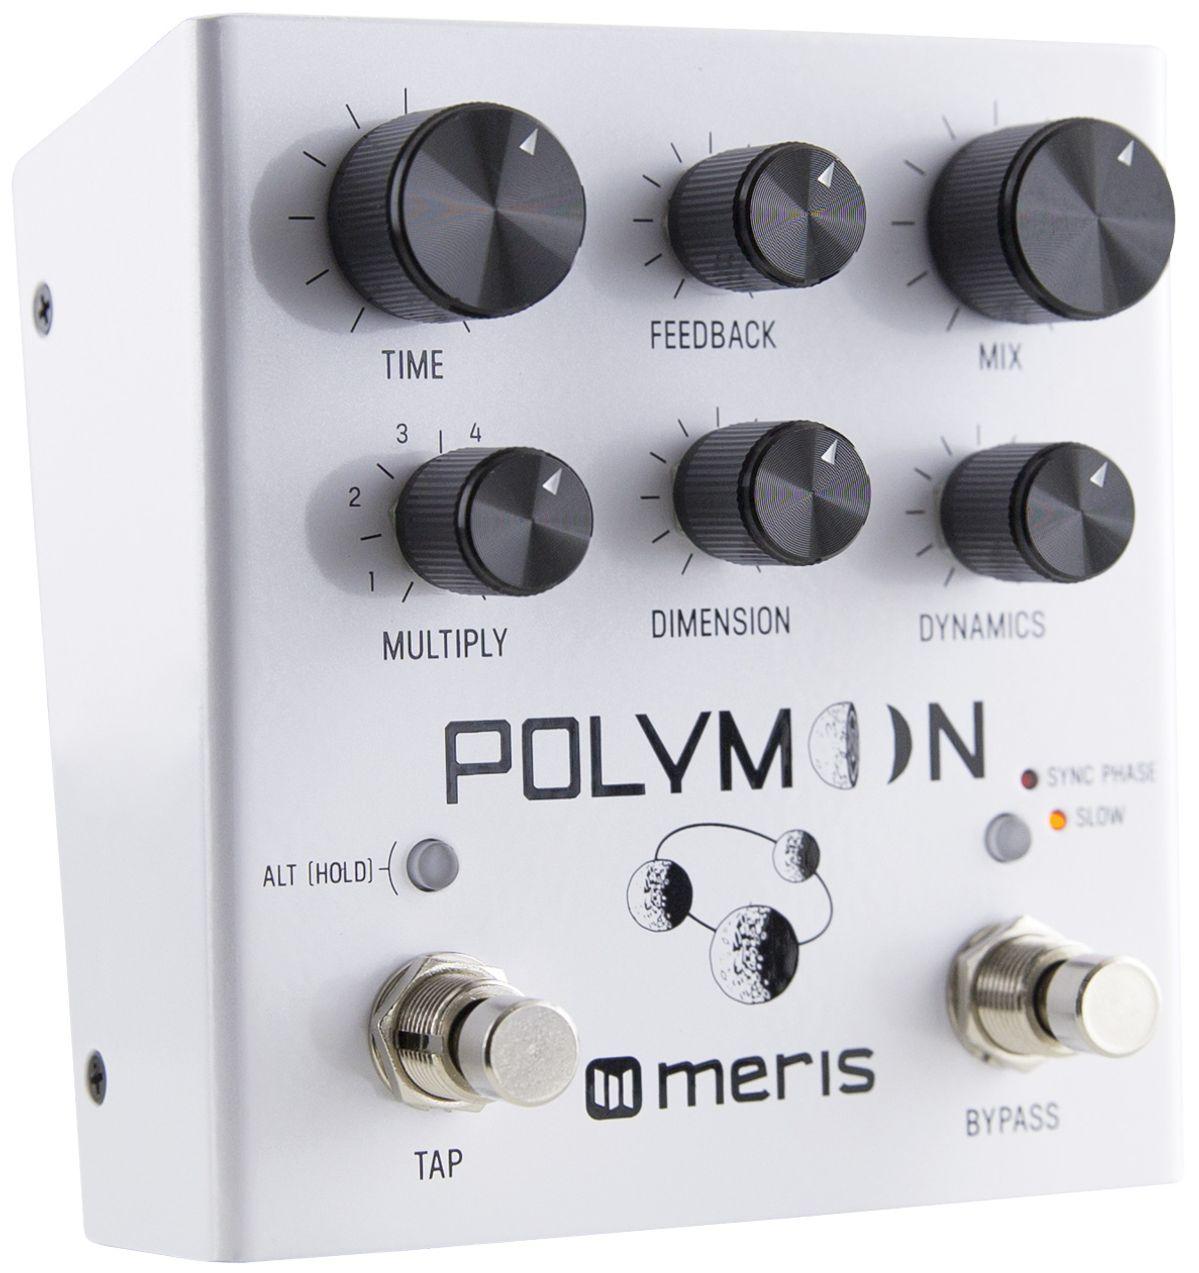 Meris Polymoon Review